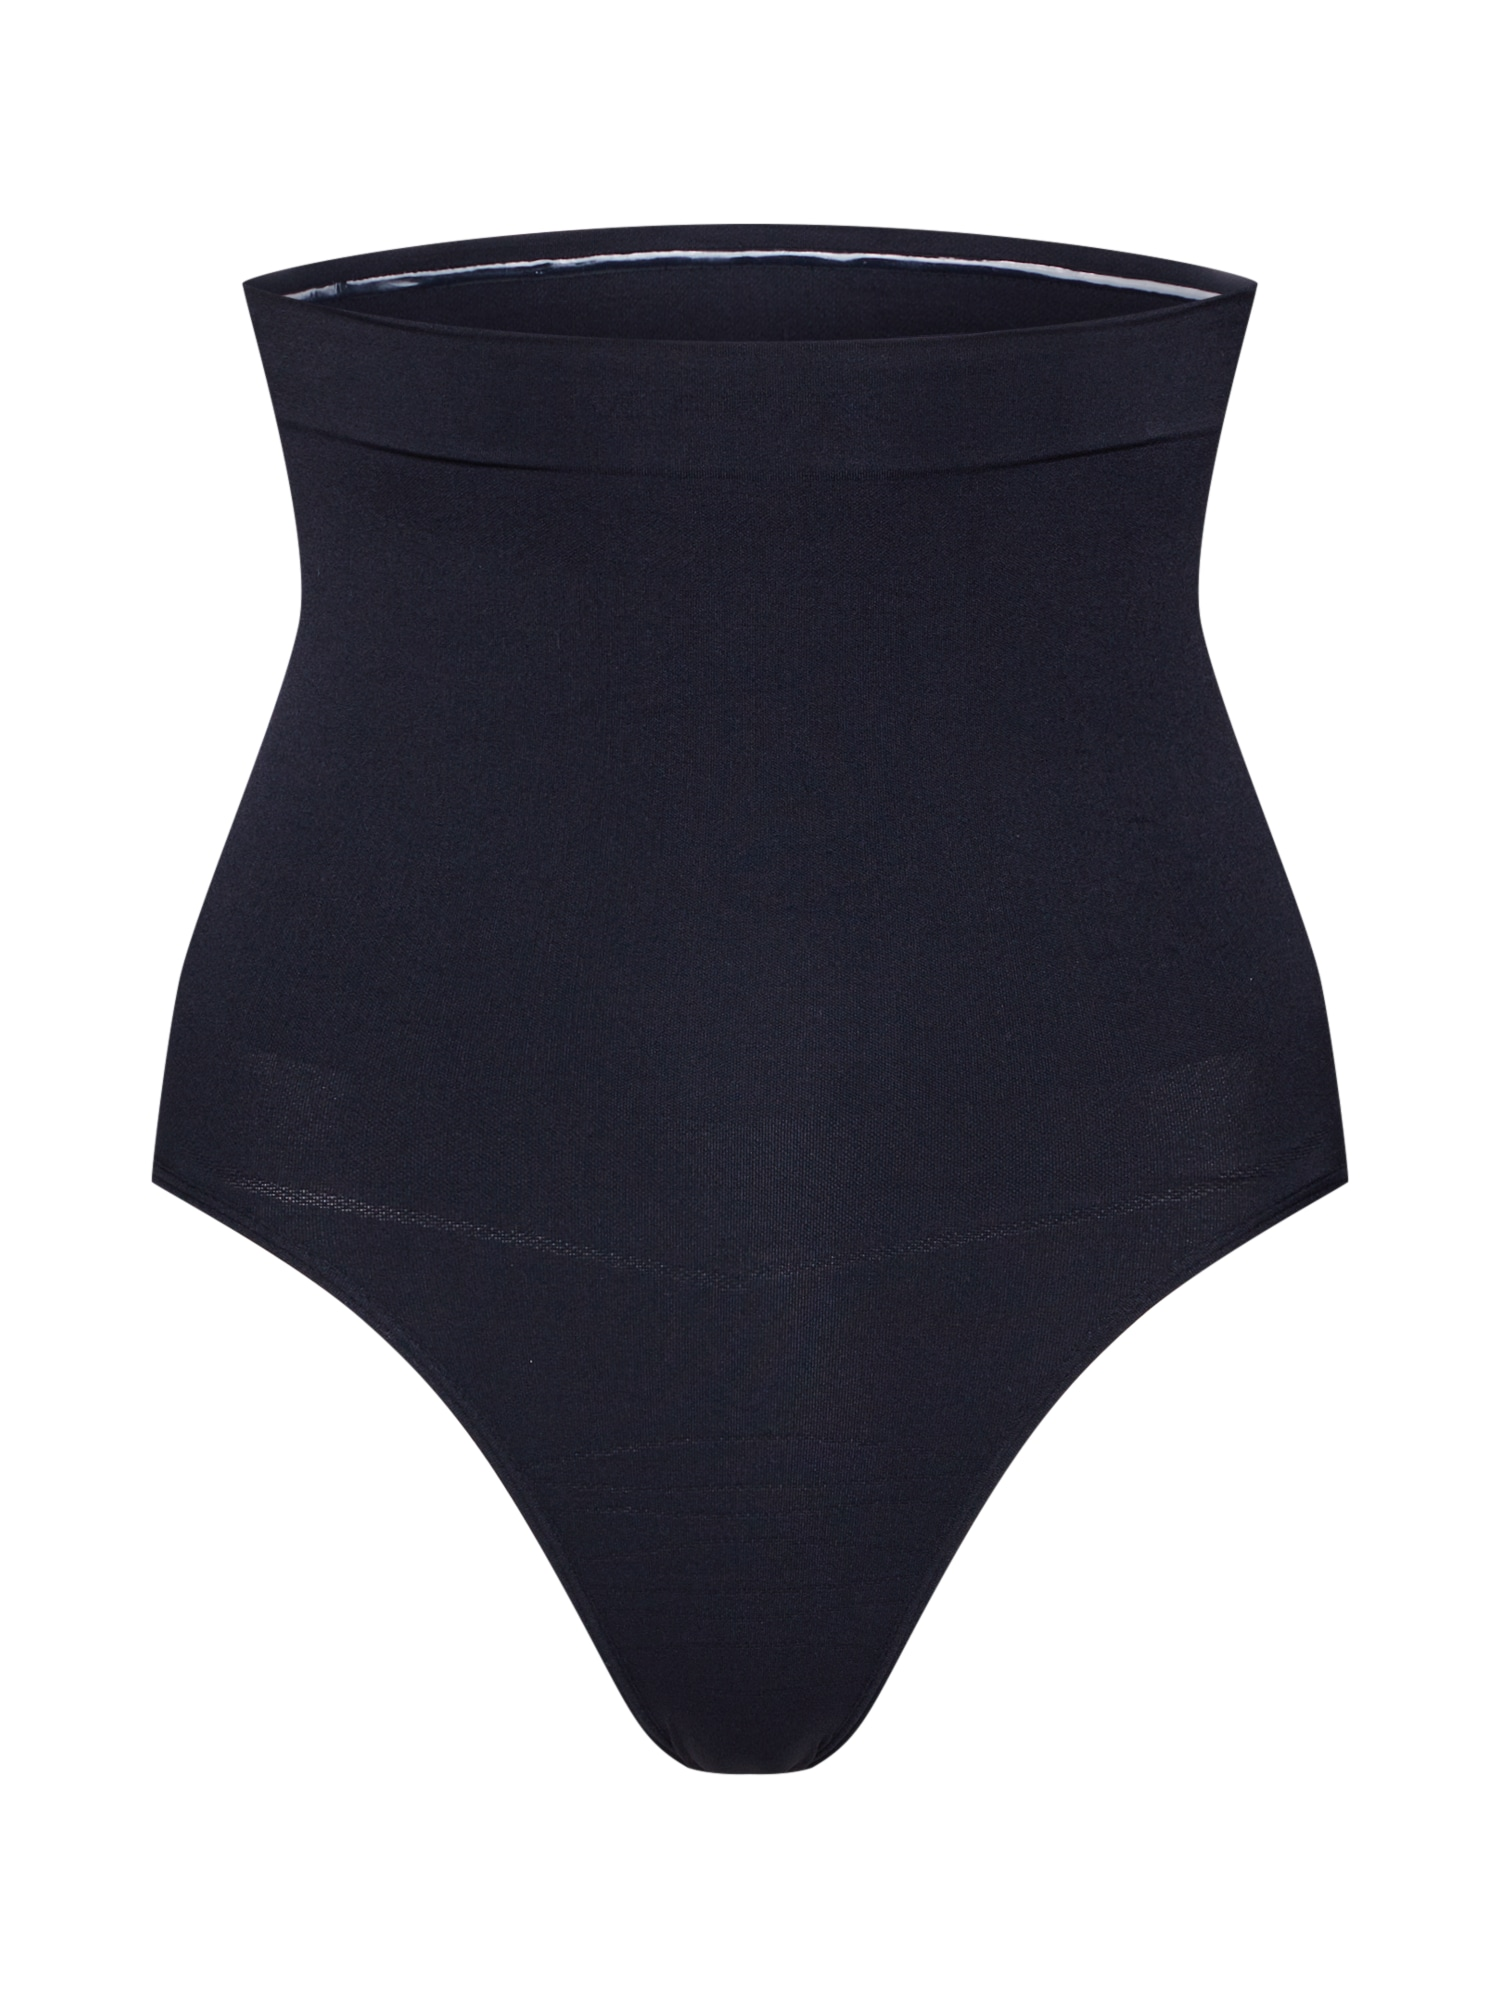 MAGIC Bodyfashion Kūną formuojančios kelnaitės 'Comfort Waistnipper Brief' juoda